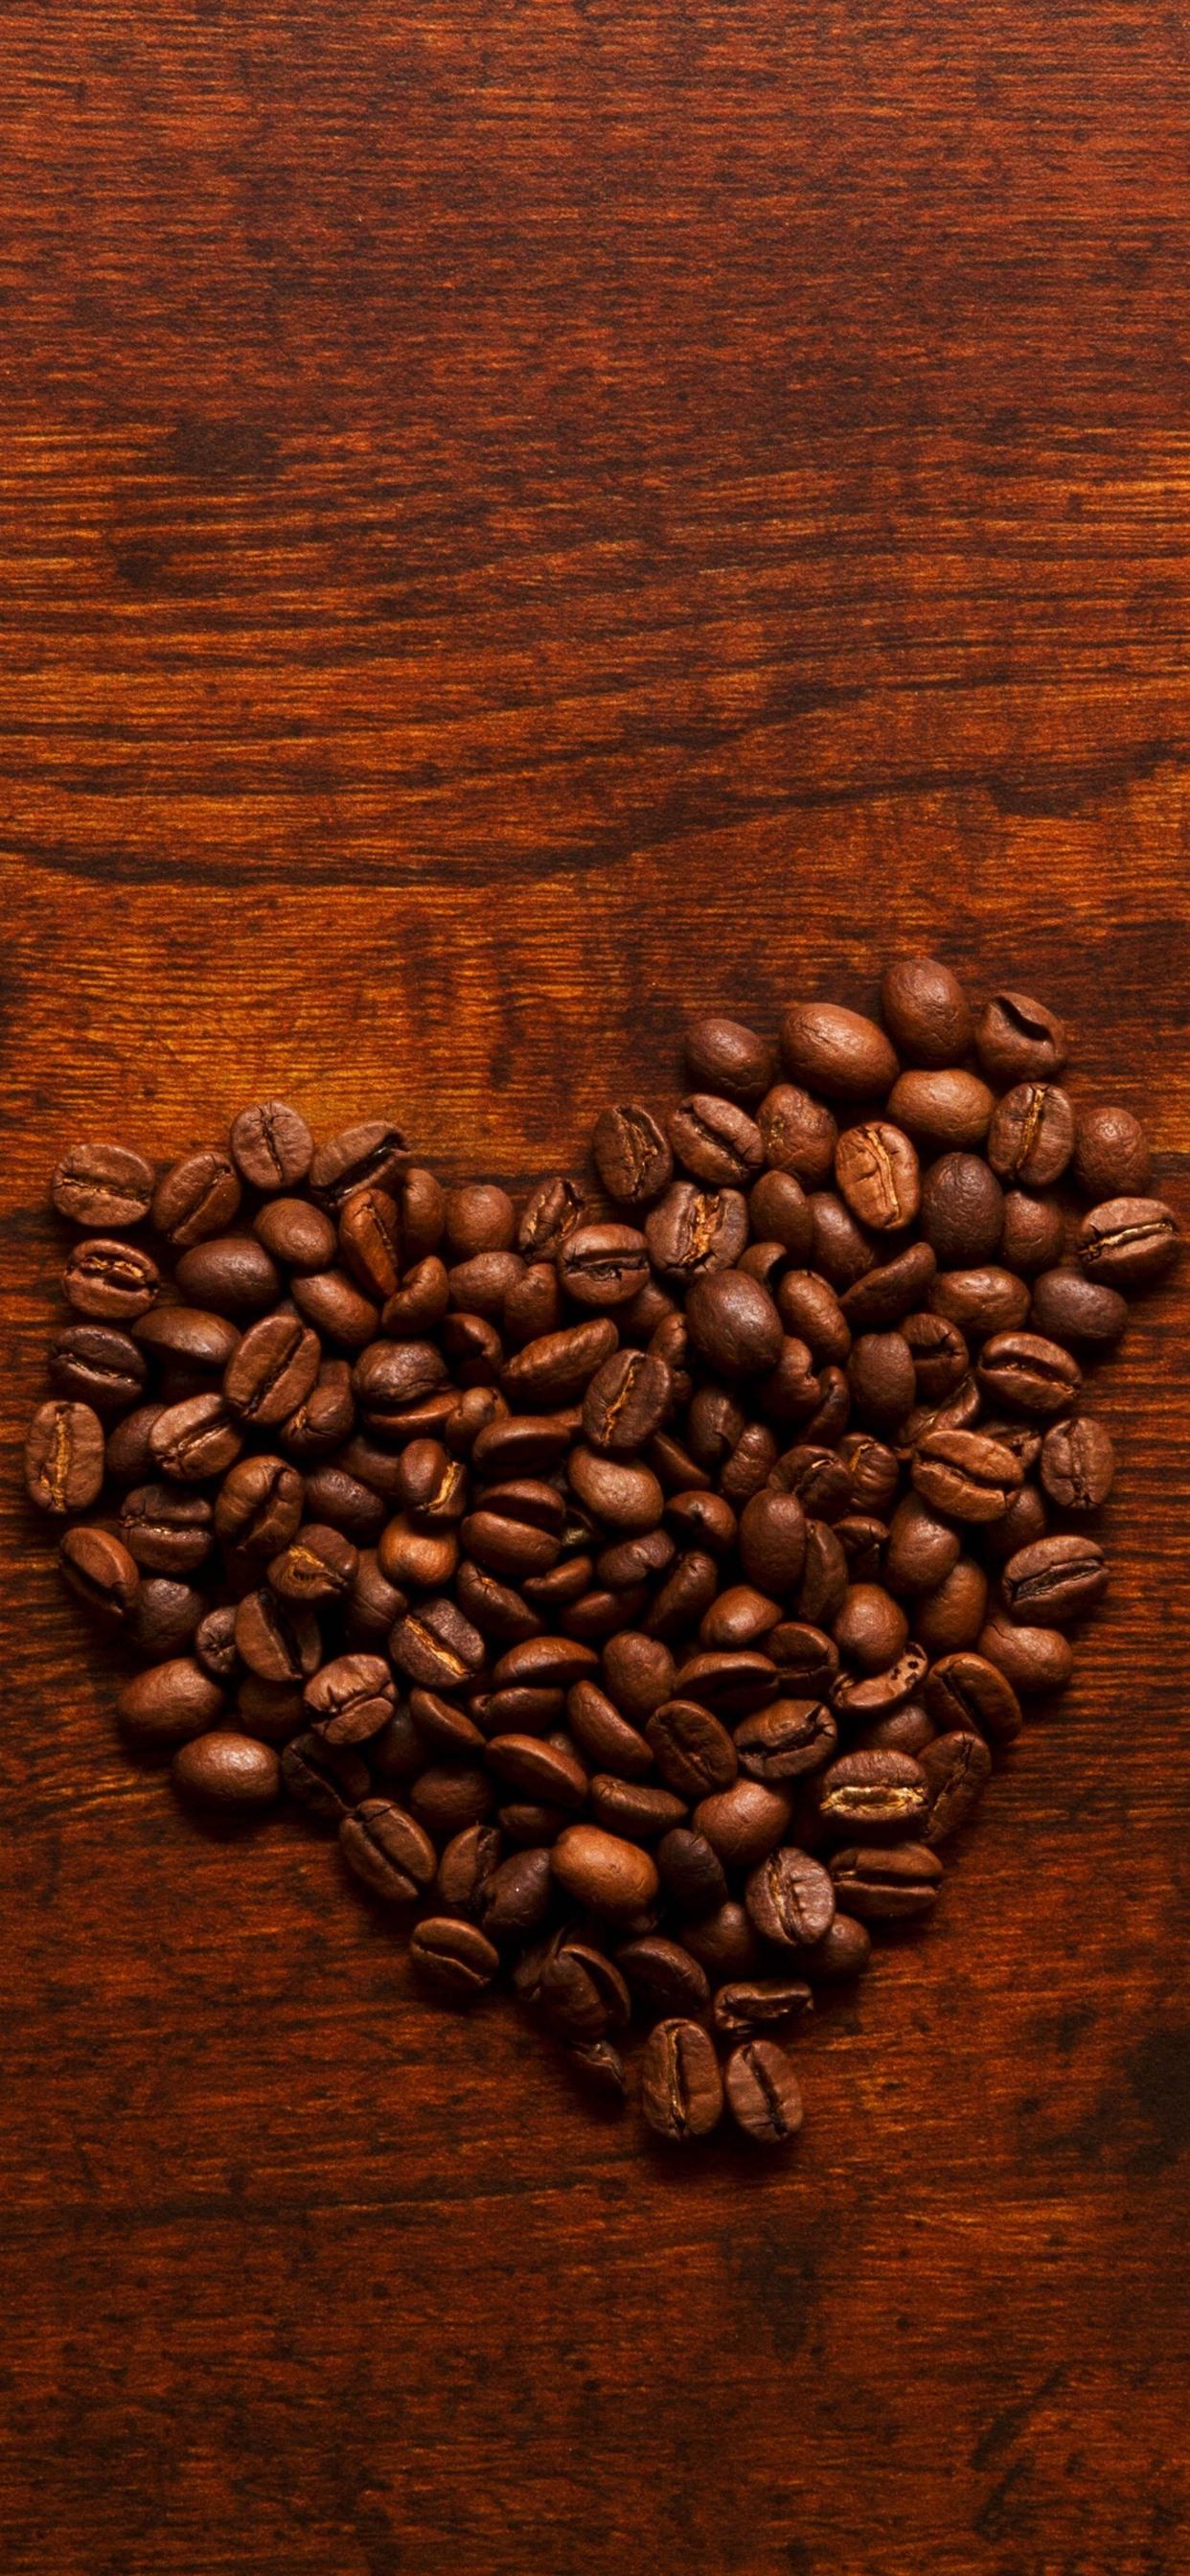 I Love Coffee Many Coffee Beans 1242x2688 Iphone Xs Max